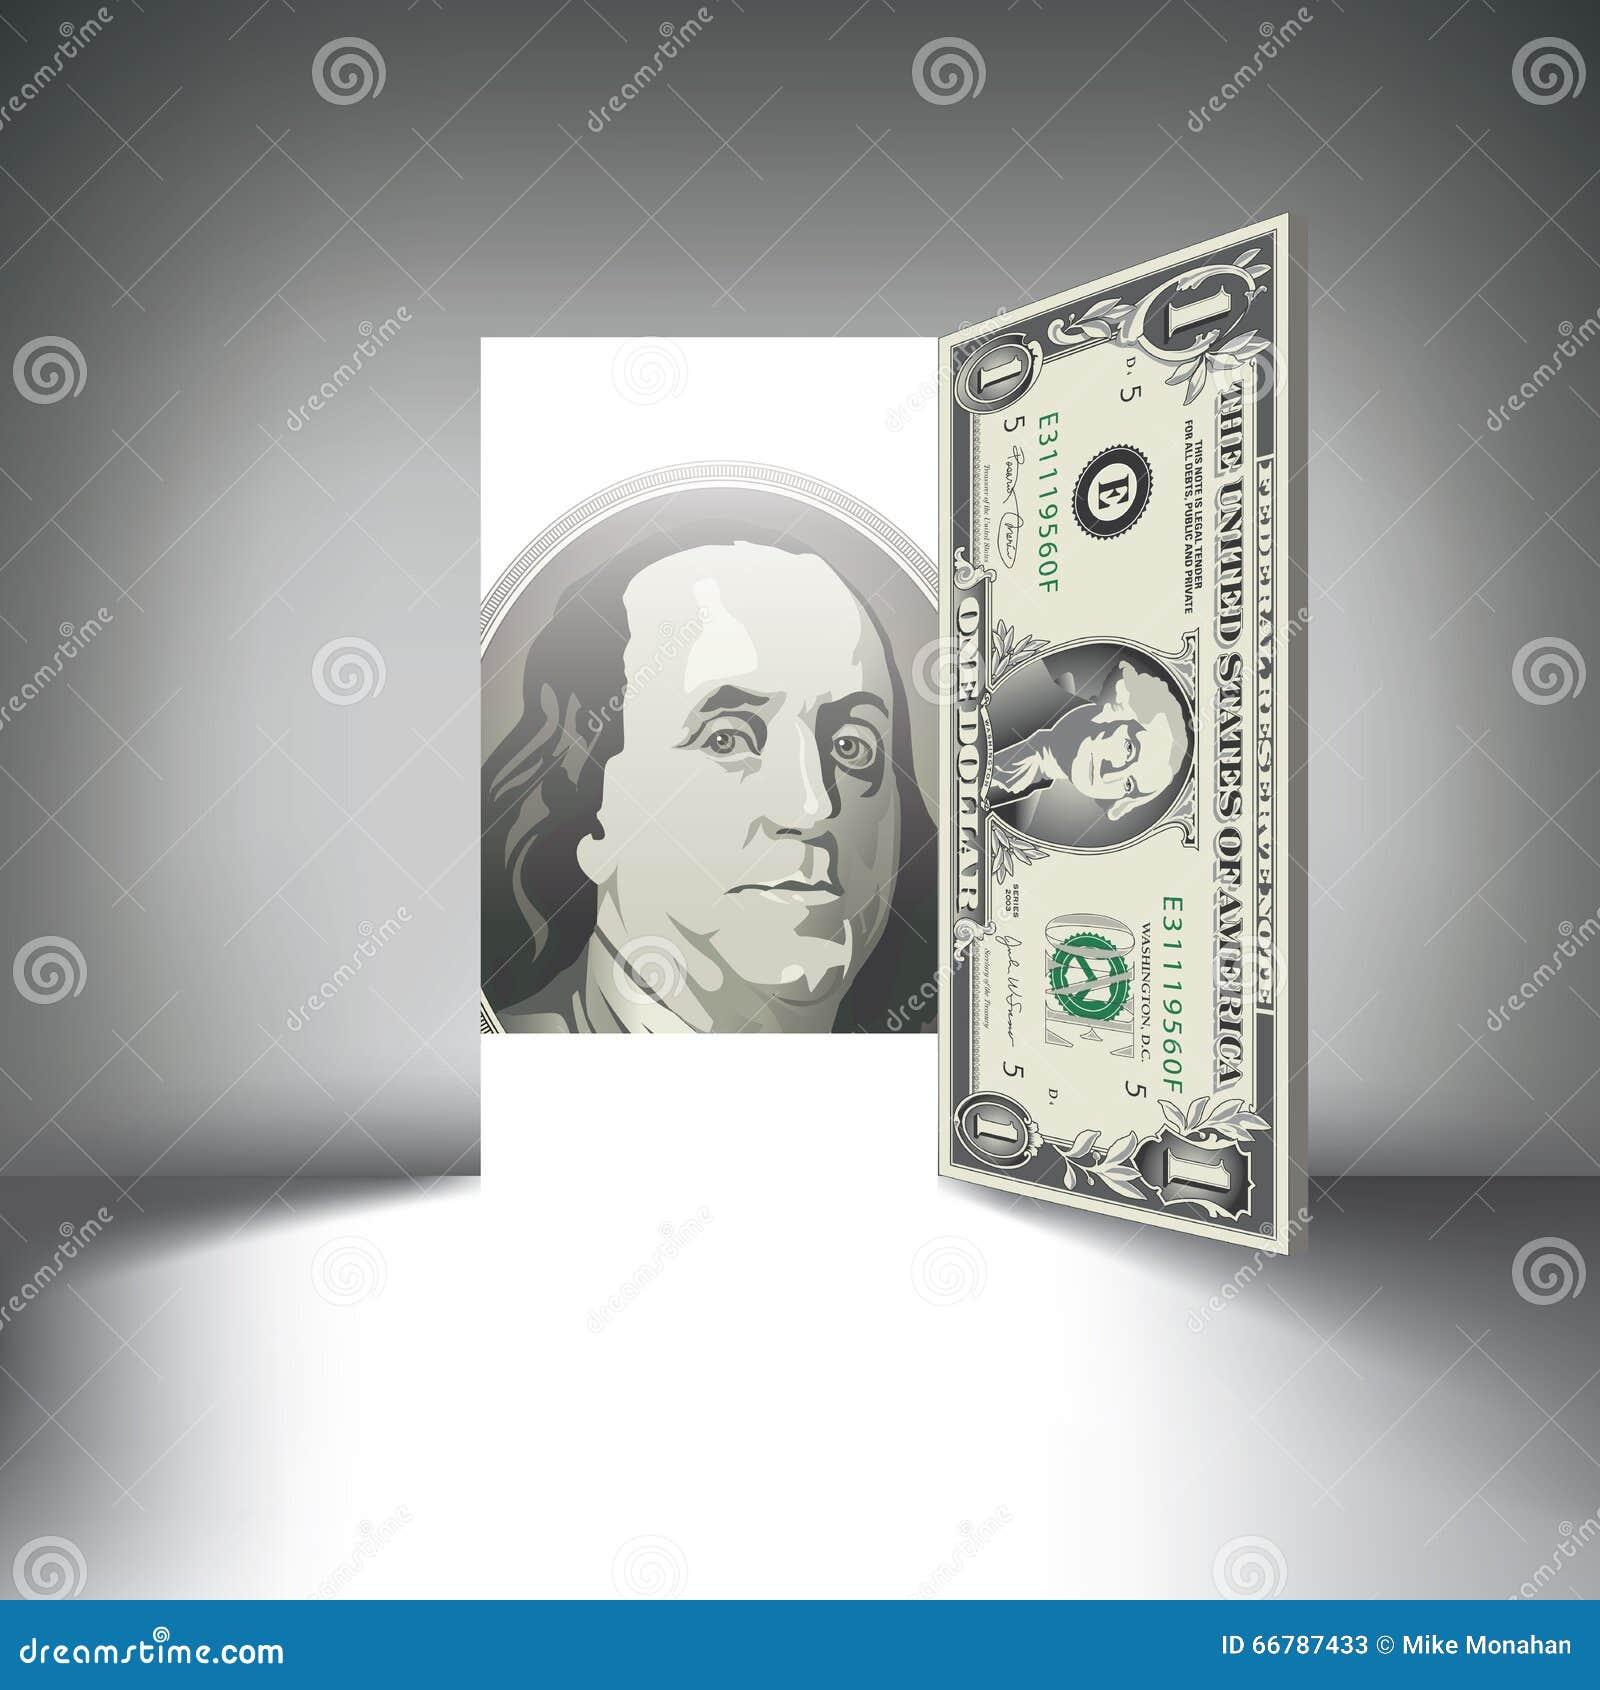 A dollar bill door beckons you